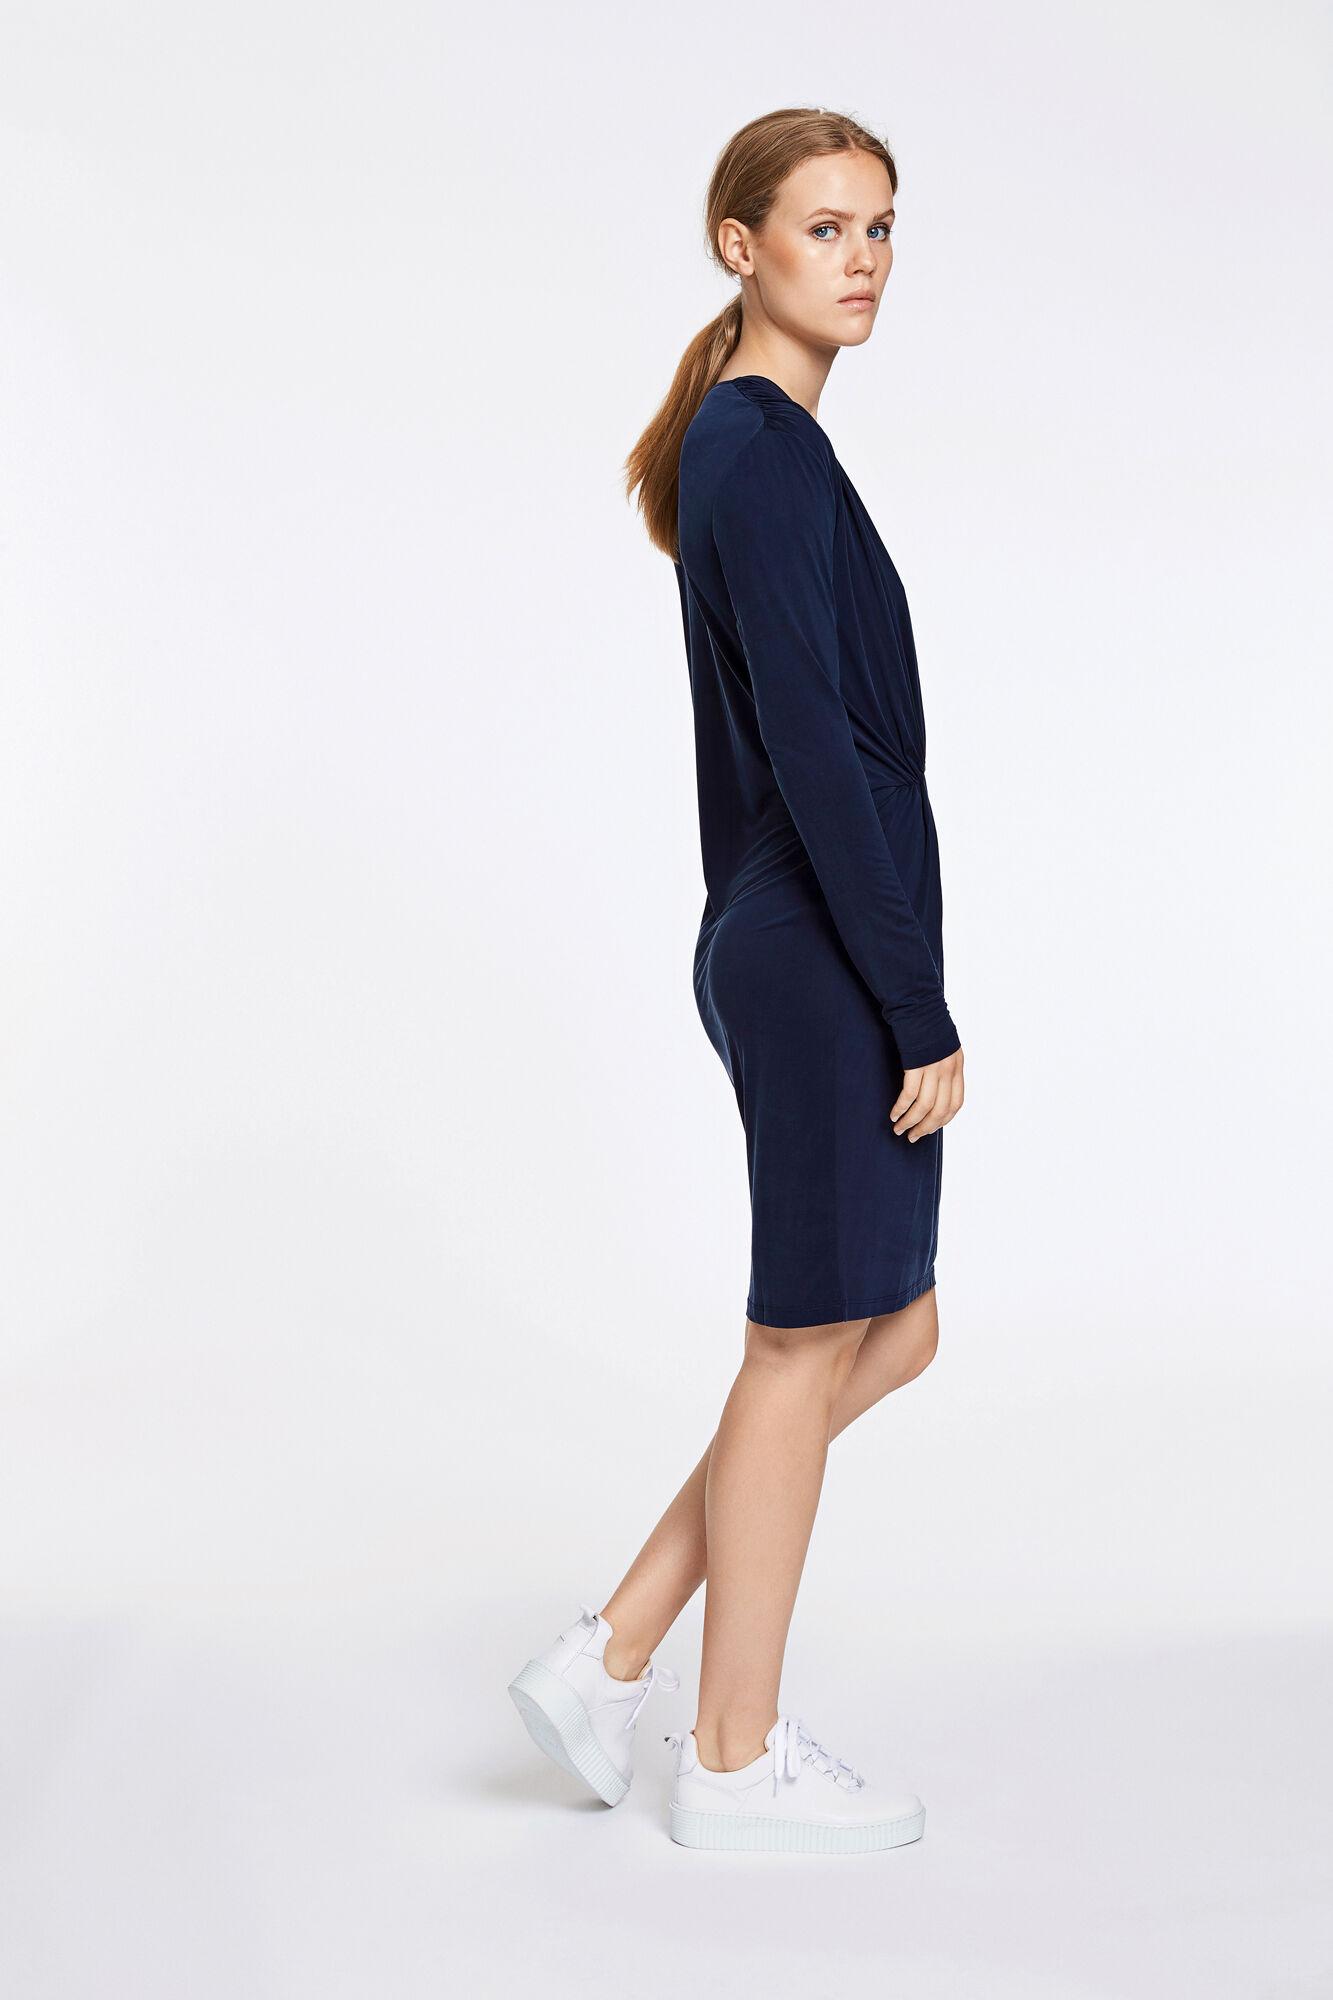 Trinny v-n dress 7551